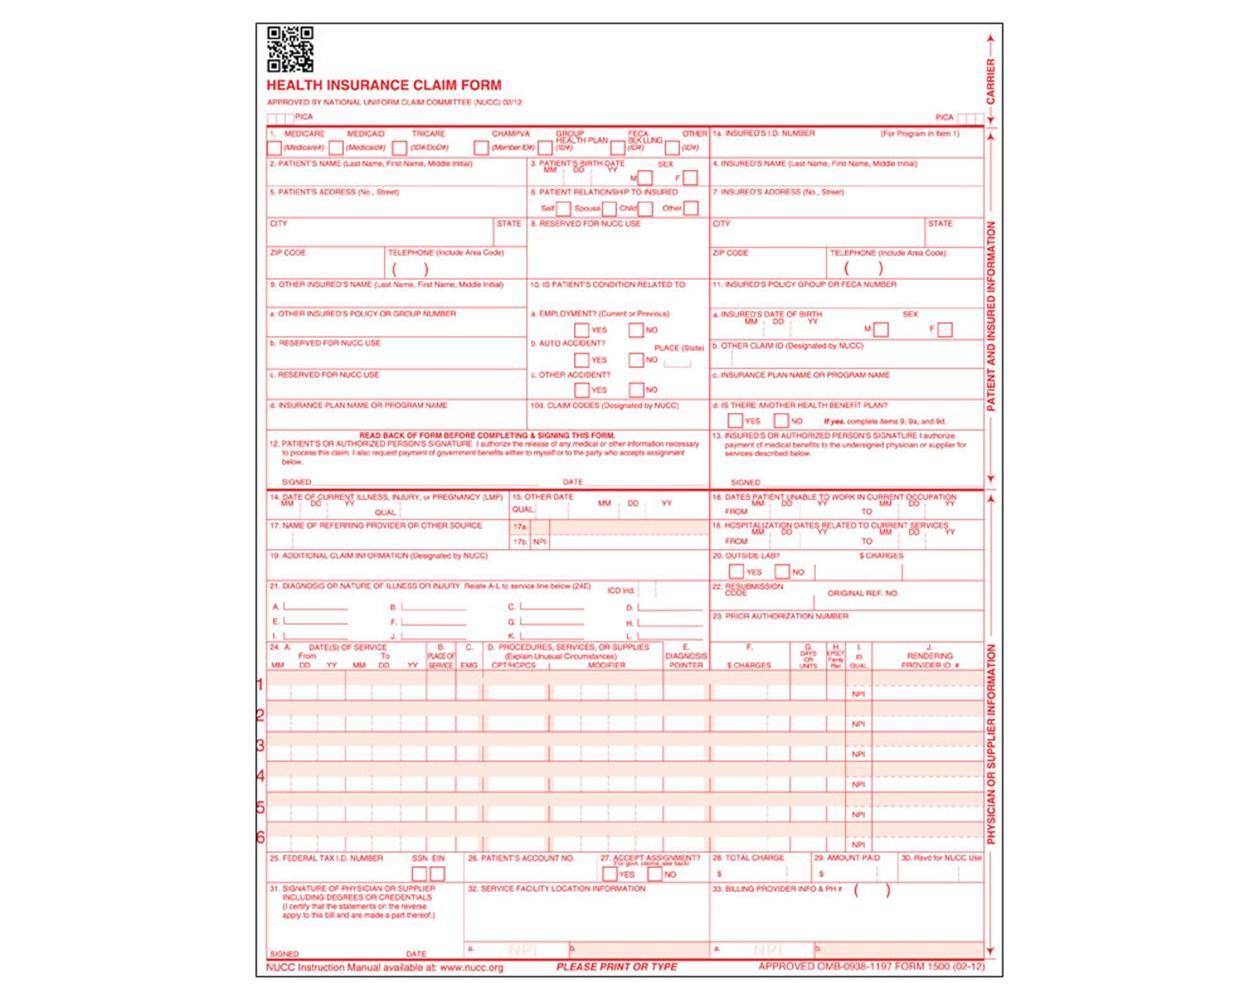 Hcfa 1500 Claim Form Printable